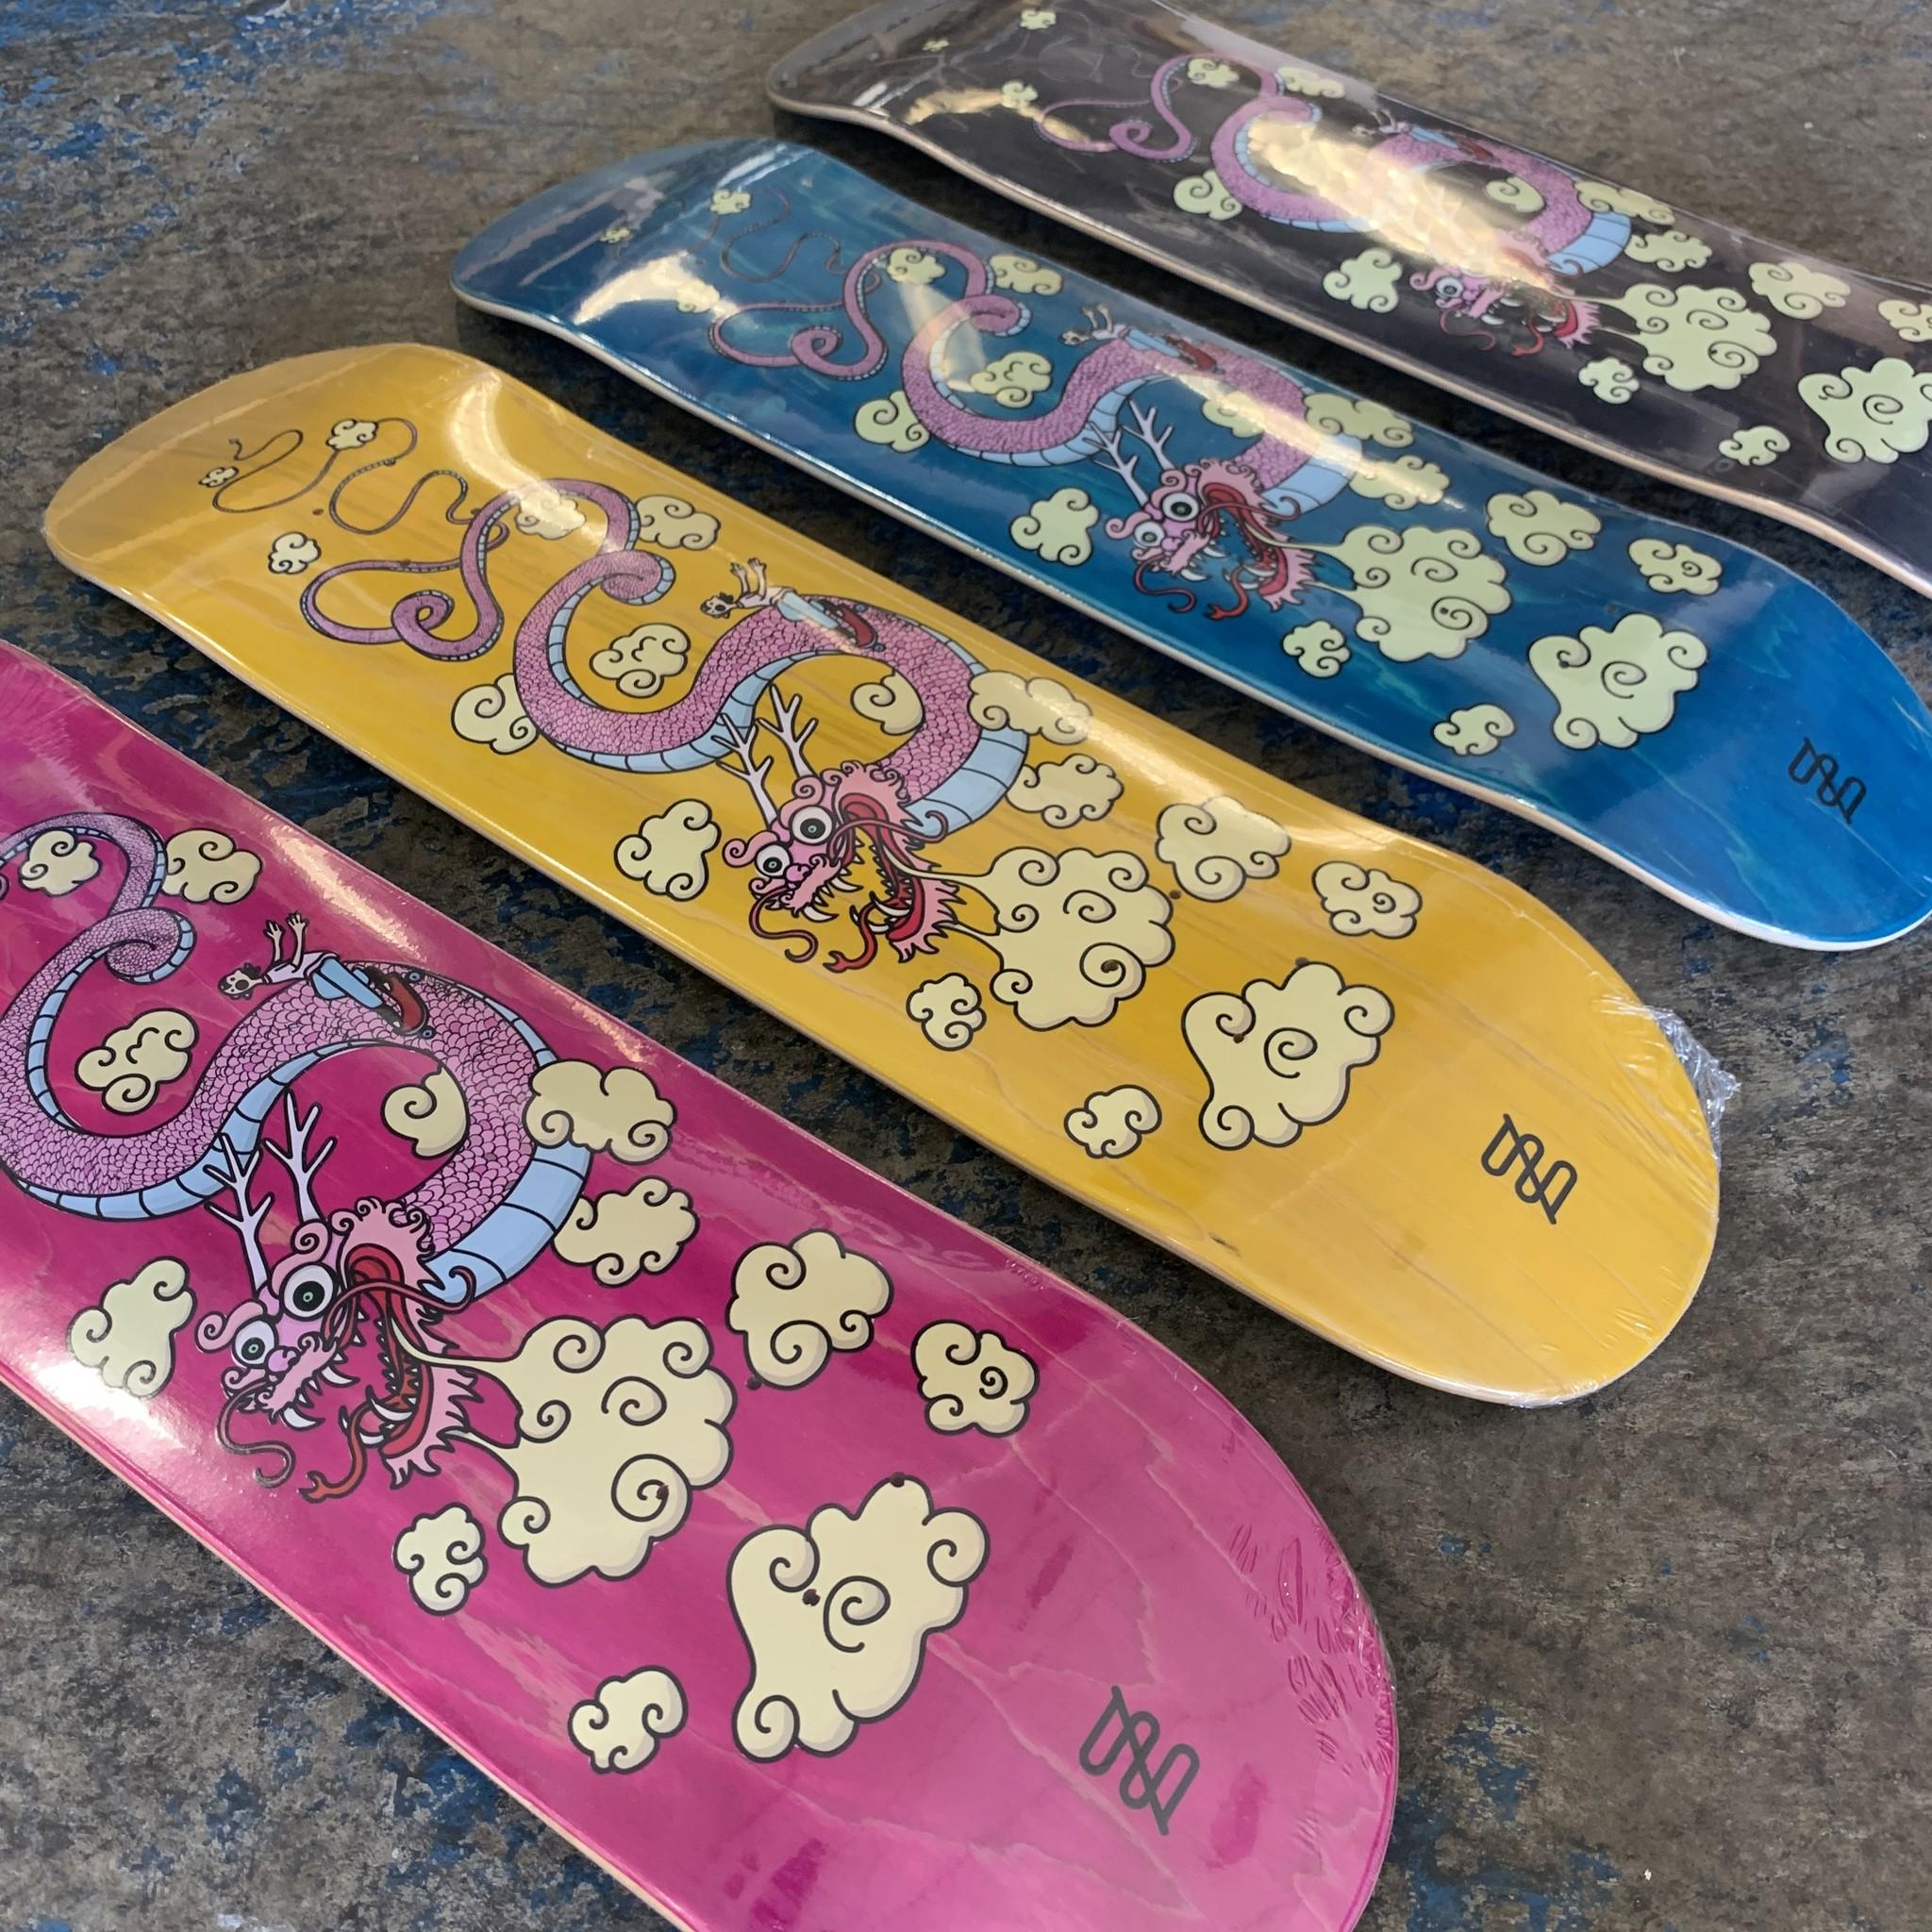 studio skate supply chartoonz dragon 9.0 deck